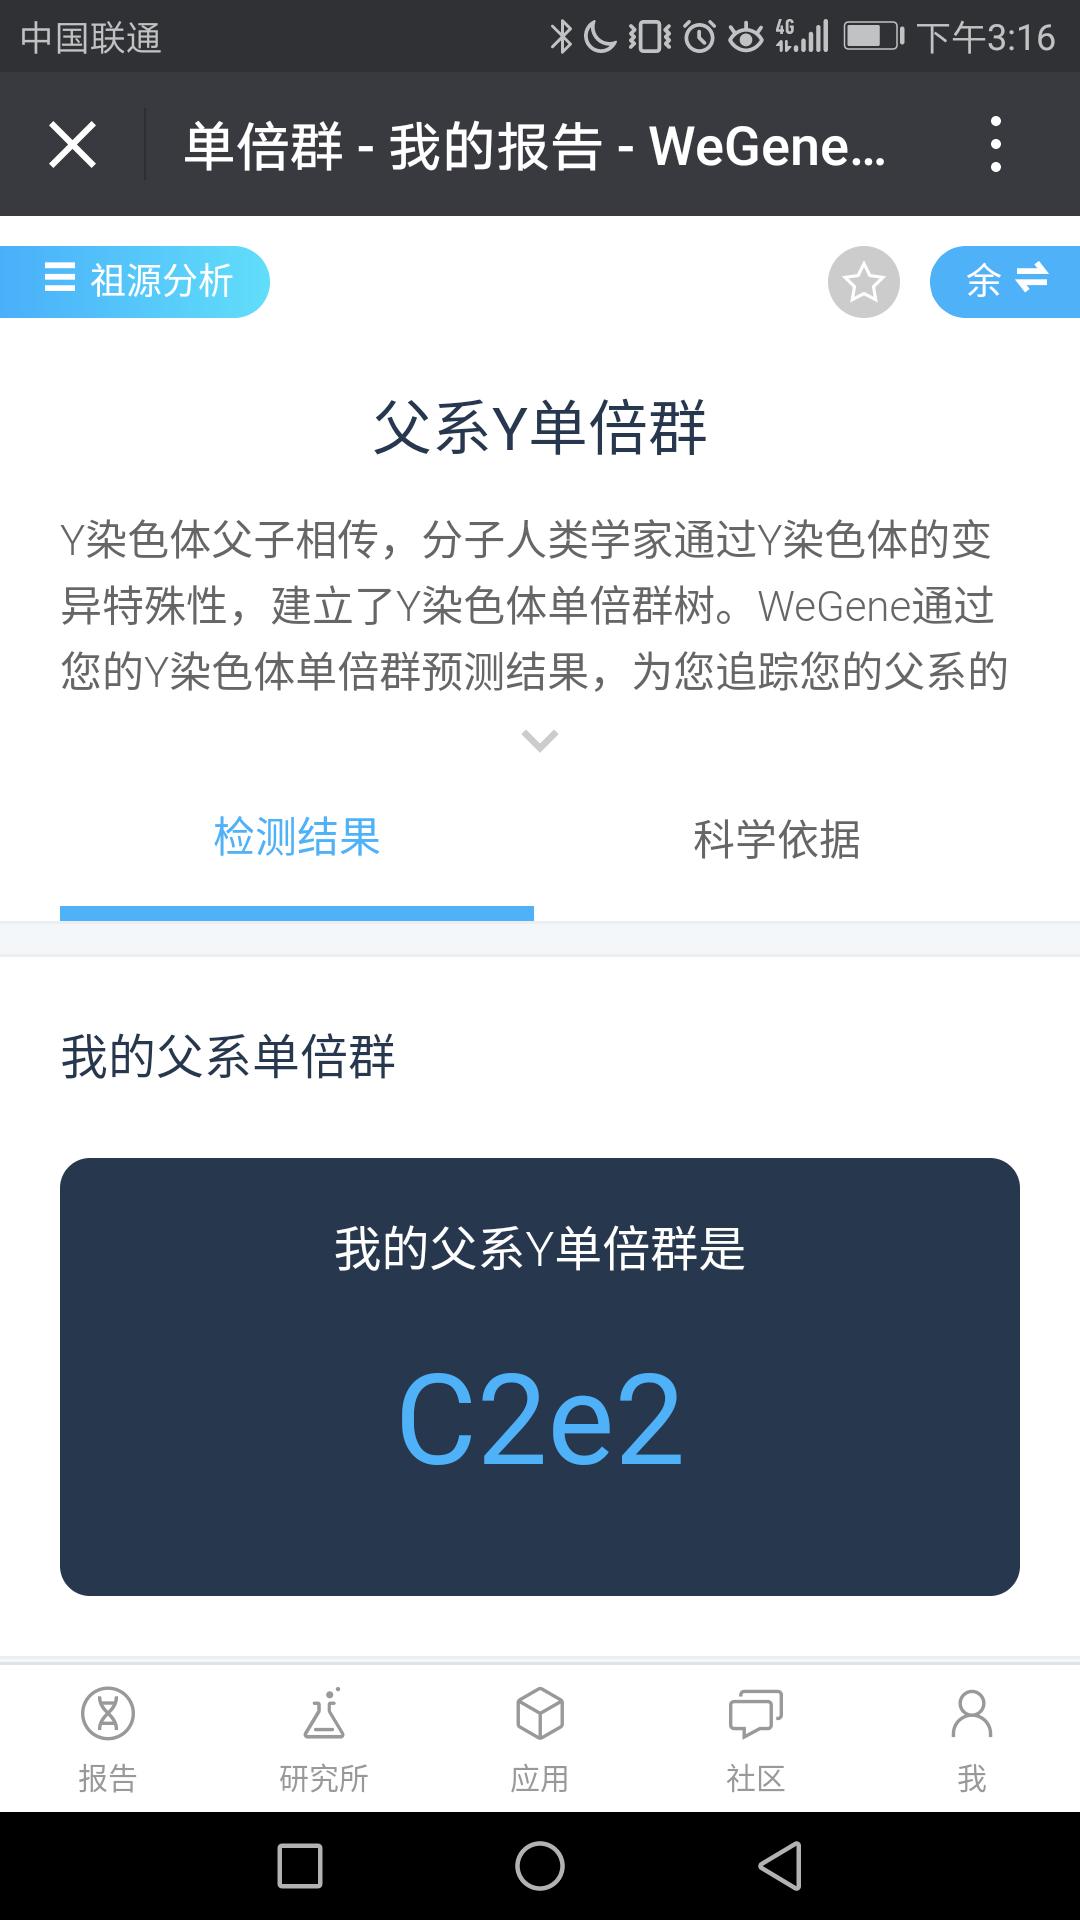 Screenshot_20171227-151642.png